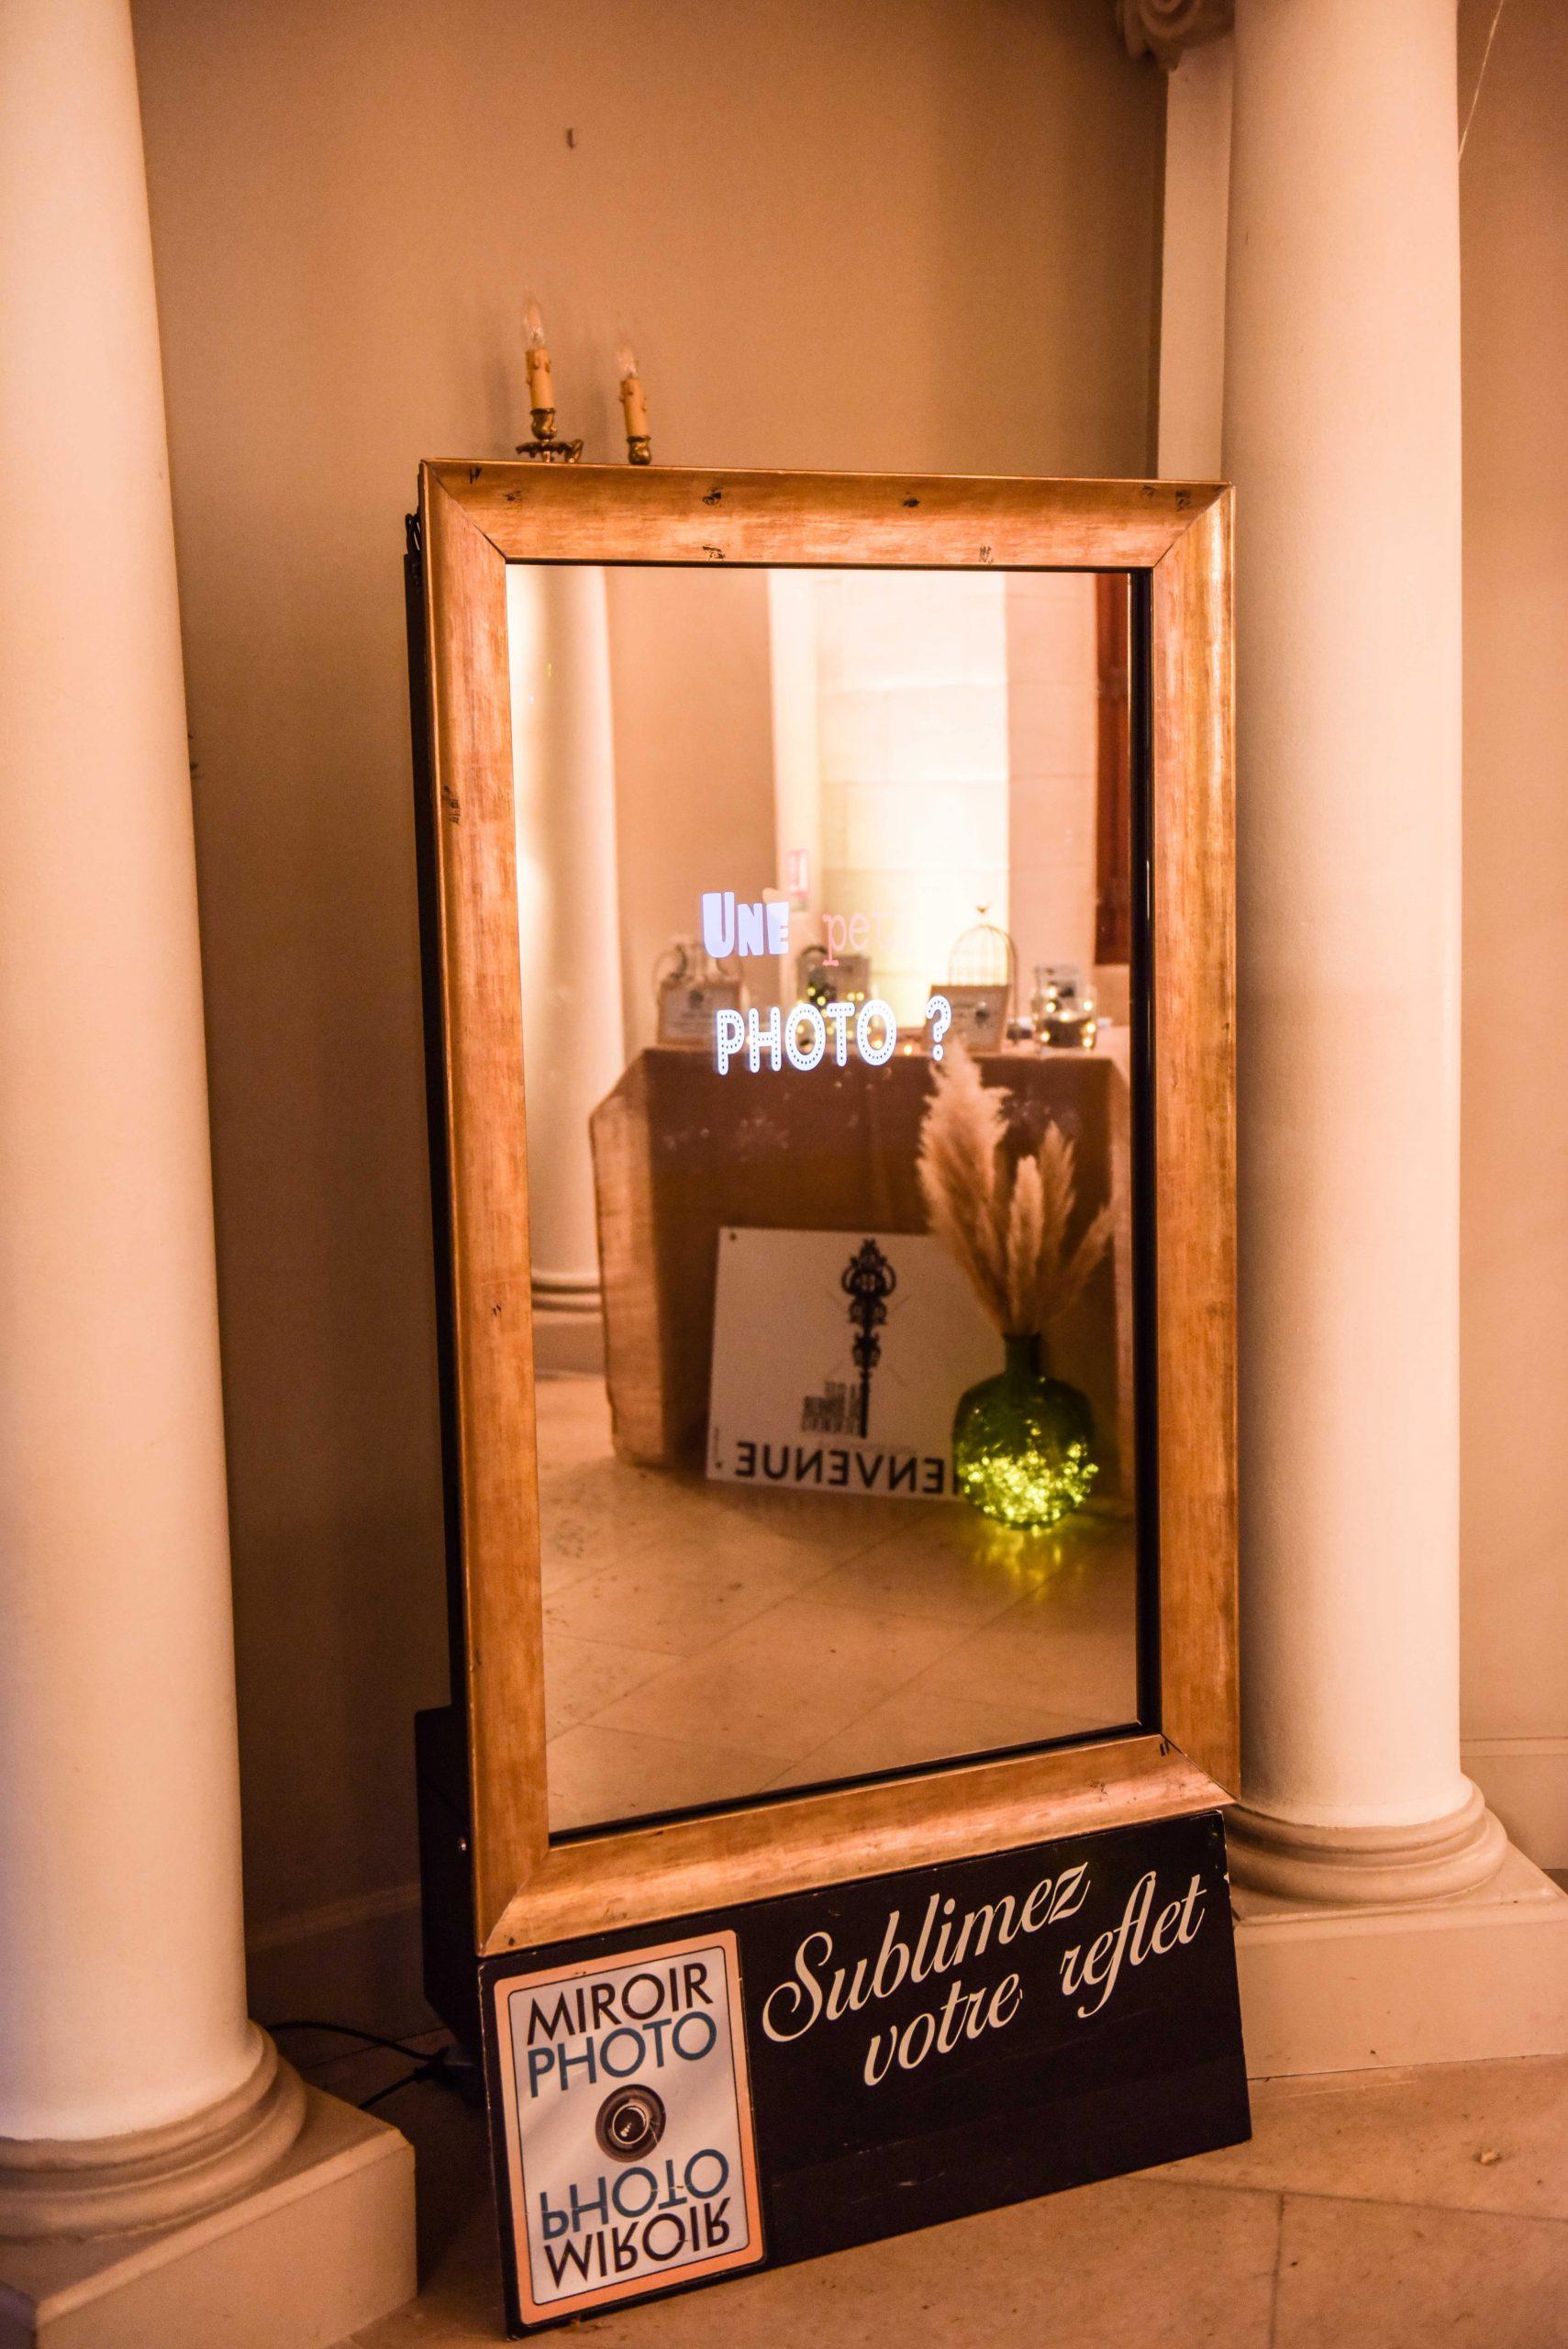 miroir-photobooth